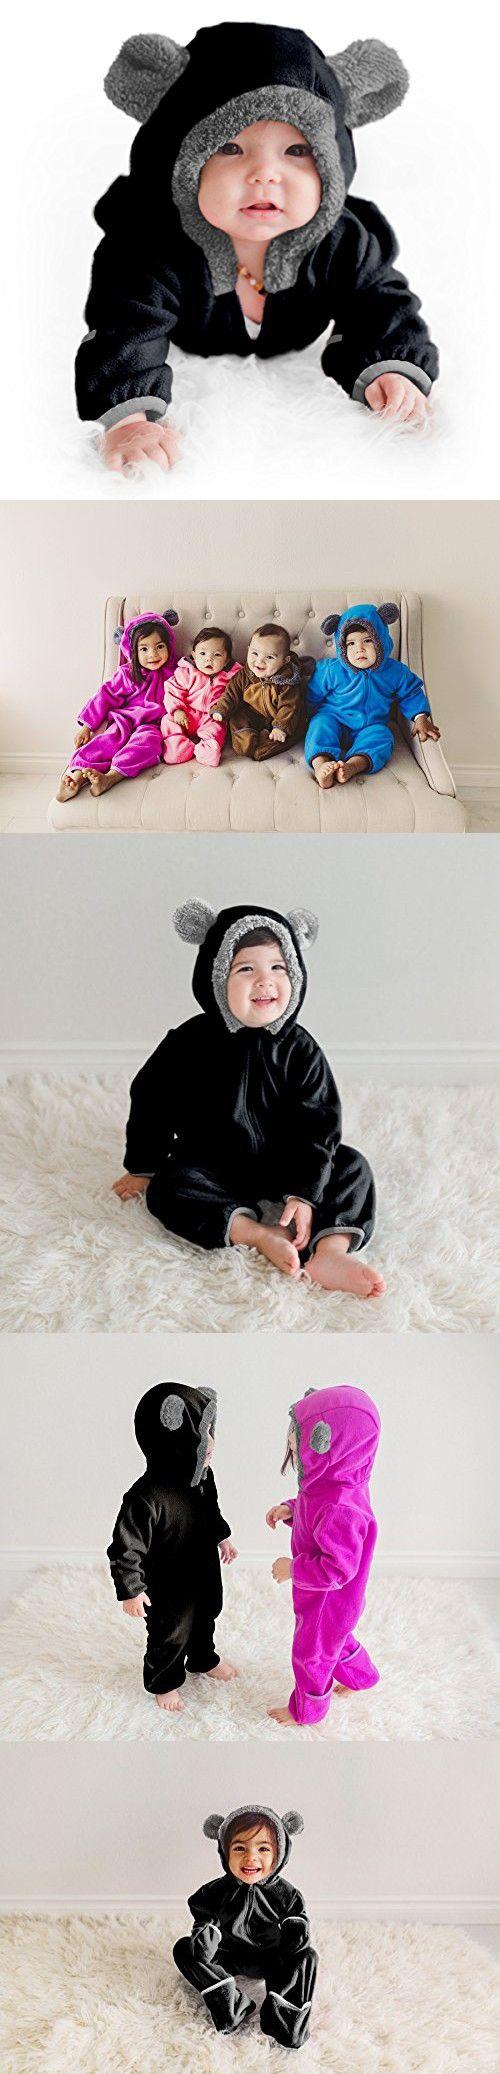 Funzies Baby Bunting Fleece Hooded Romper Bodysuit (6-12 Month, Black)